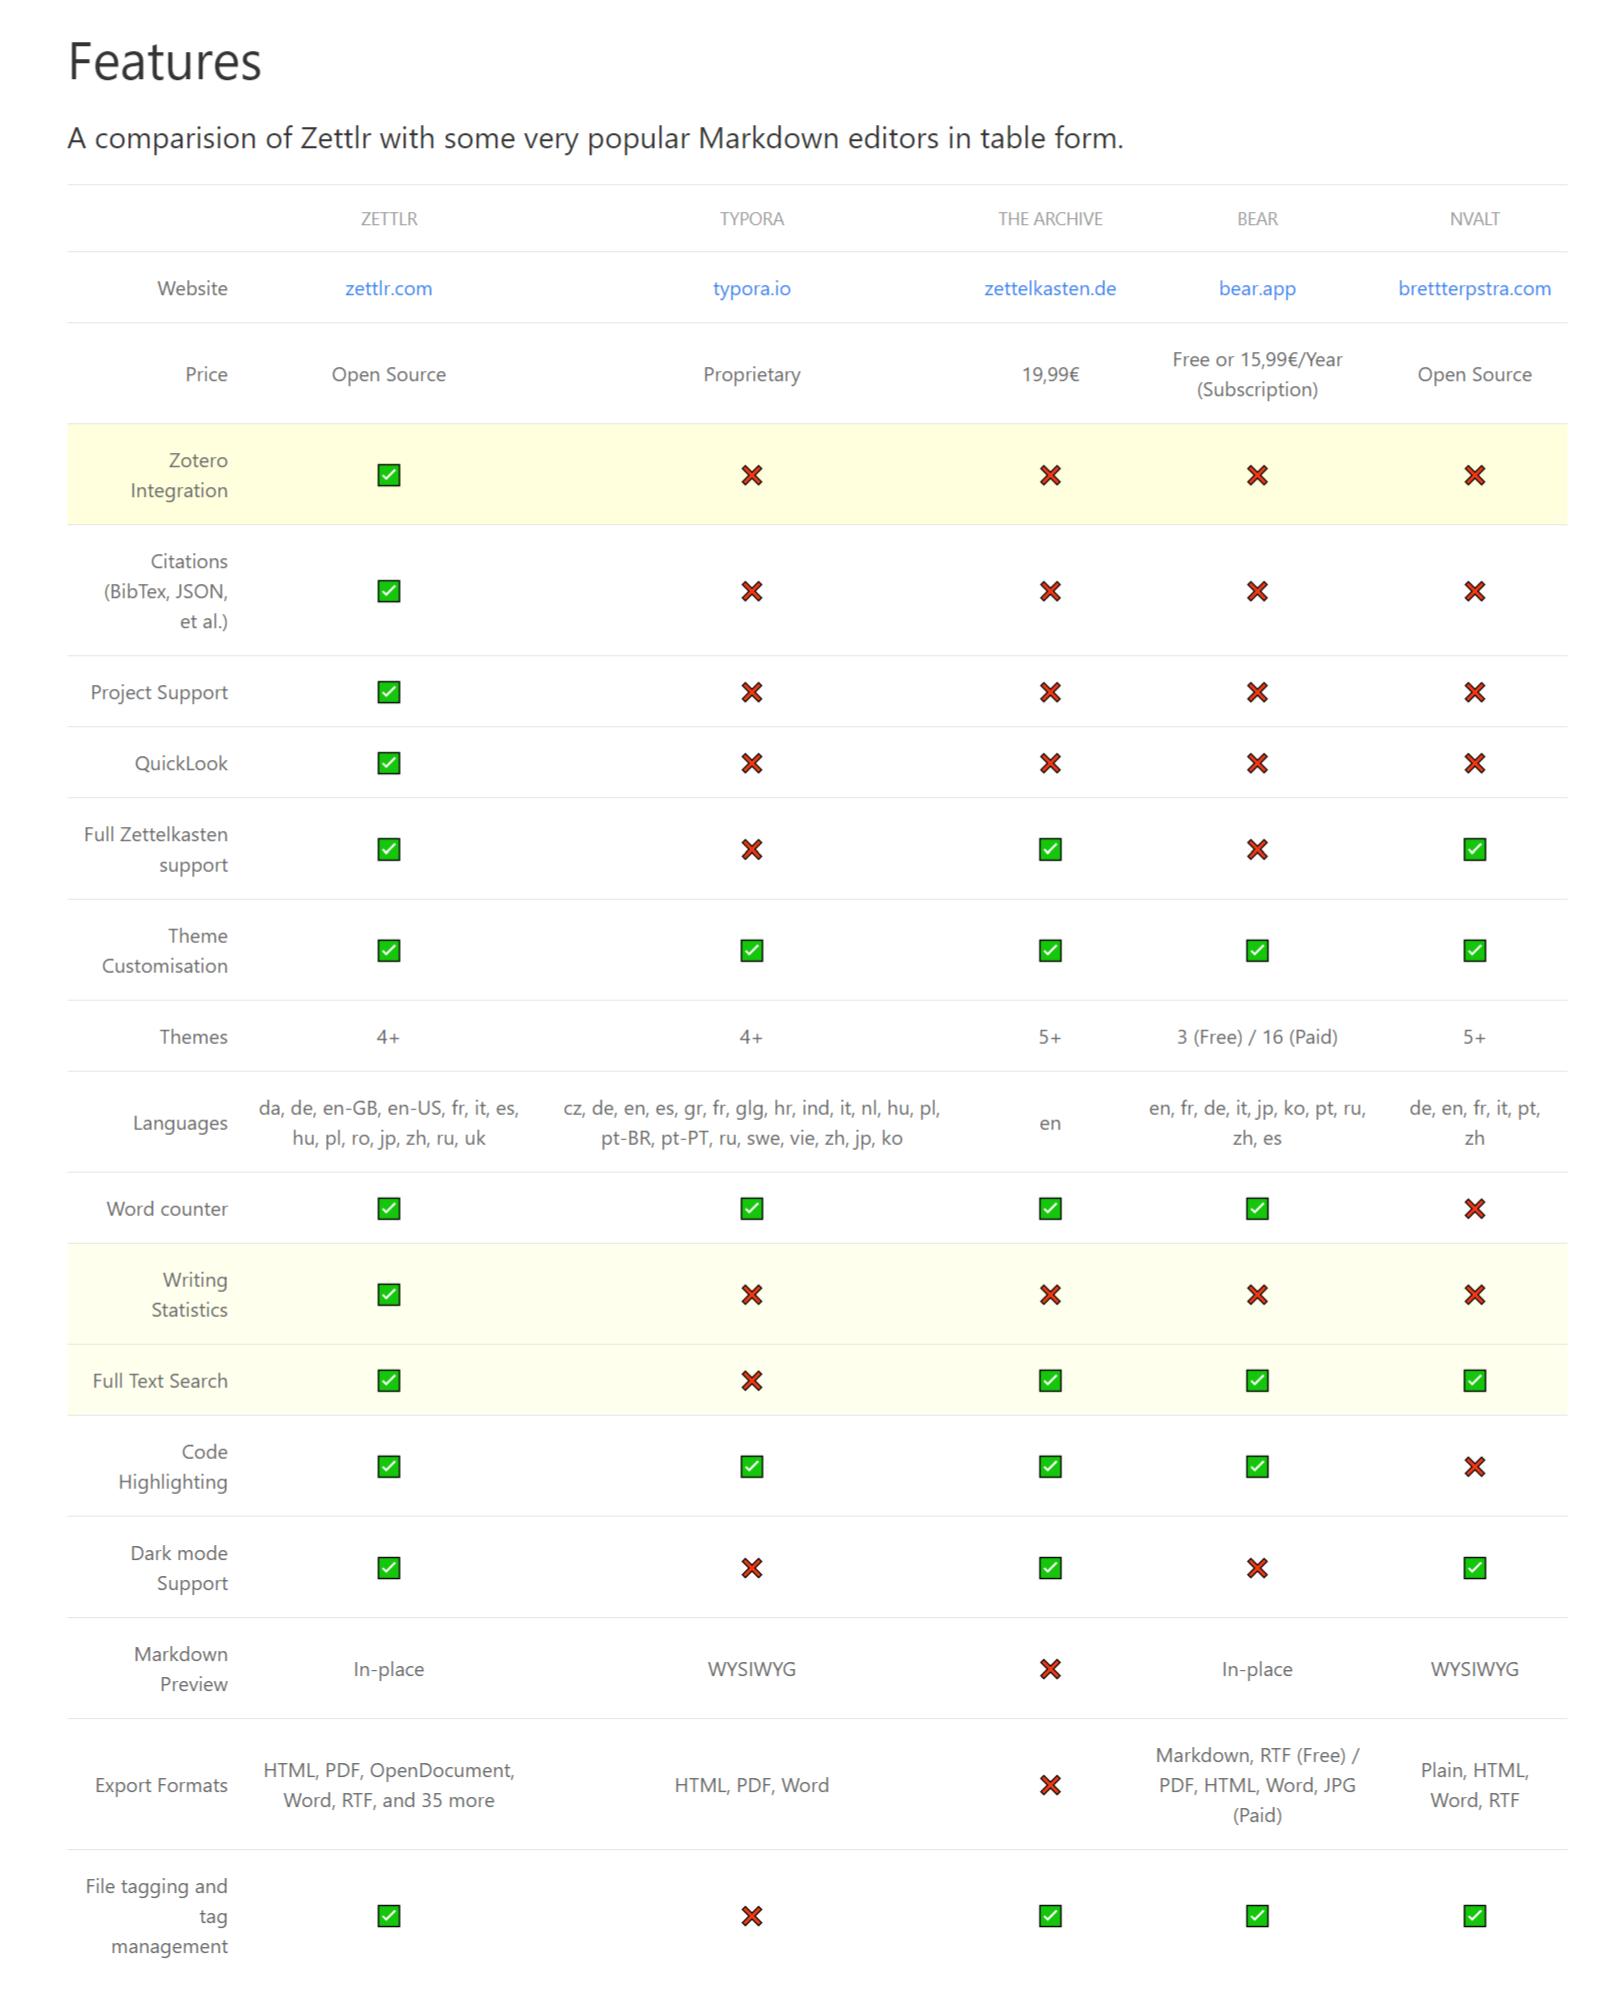 Zettlr 与其他主流 Markdown 编辑器的功能对比图